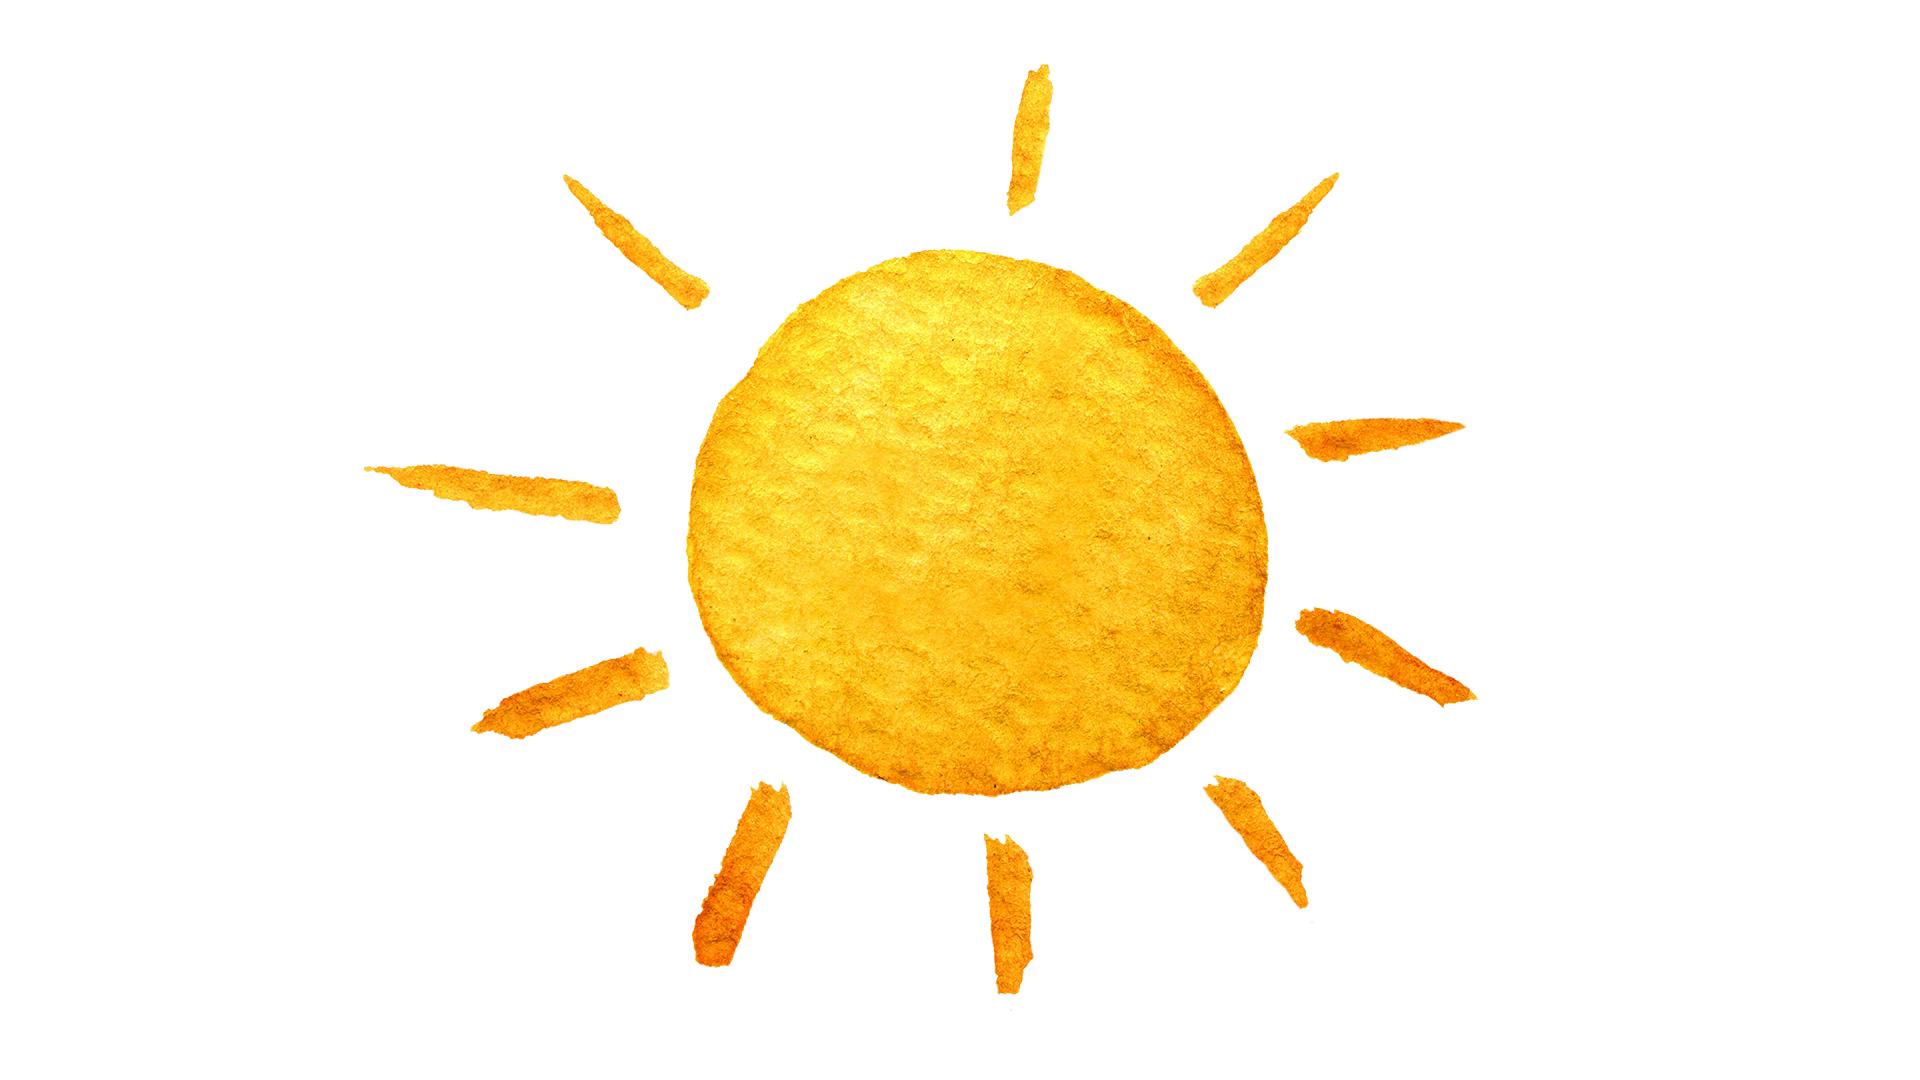 1920x1080 Cute Cartoon Sun. Hand Drawn Watercolor Illustration. Watercolour